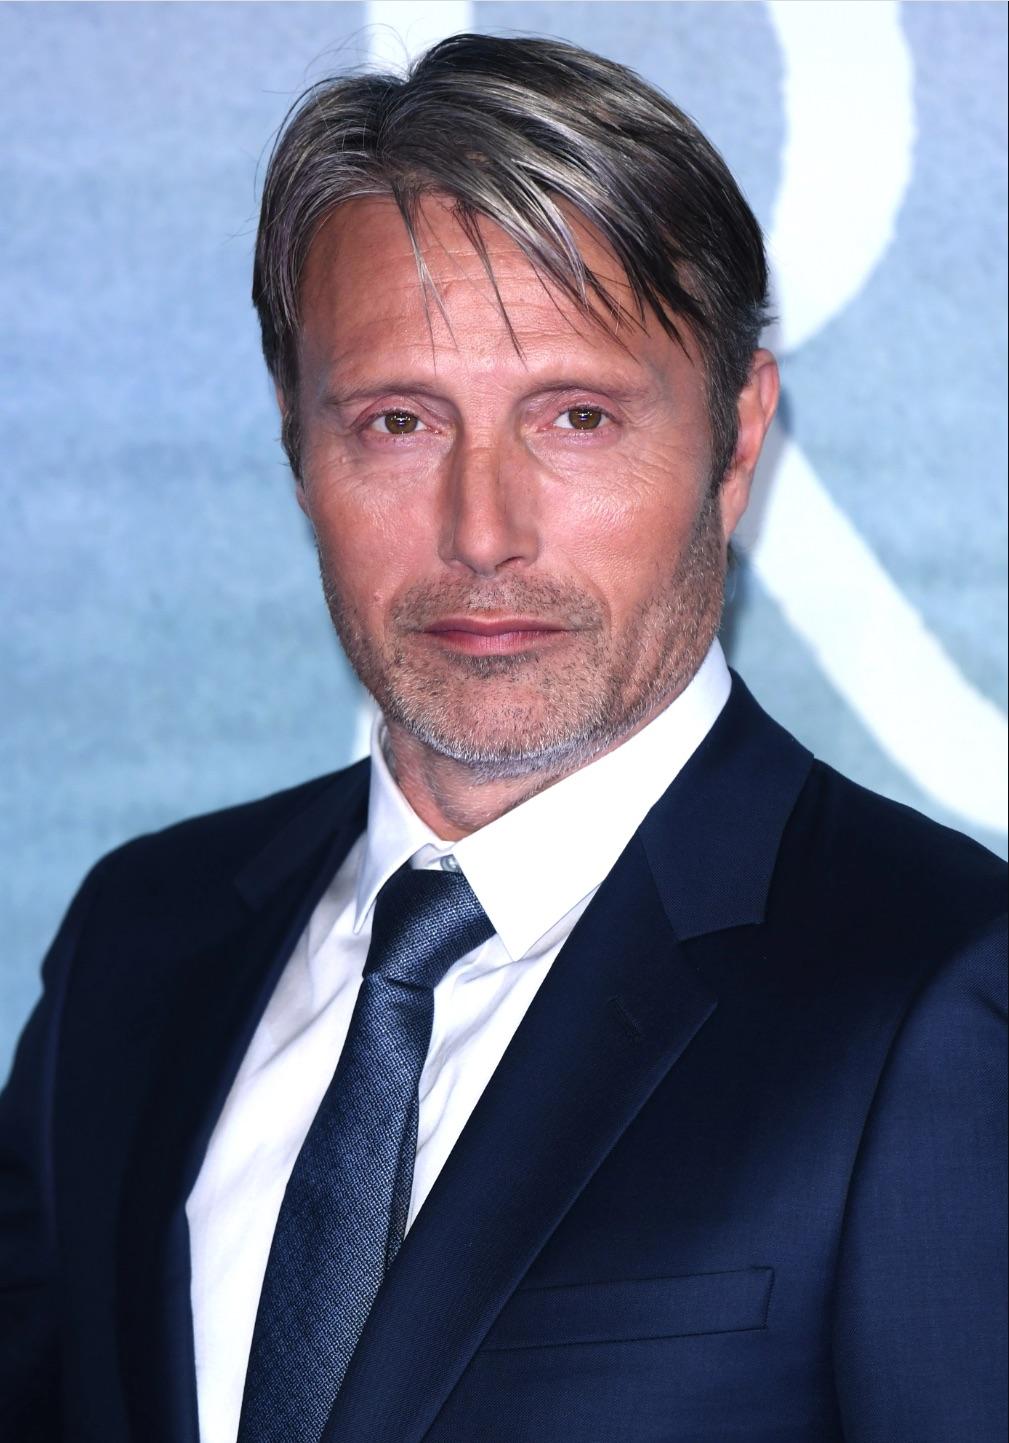 Mads Mikkelsen | James Bond Wiki | Fandom powered by Wikia Casinoroyale